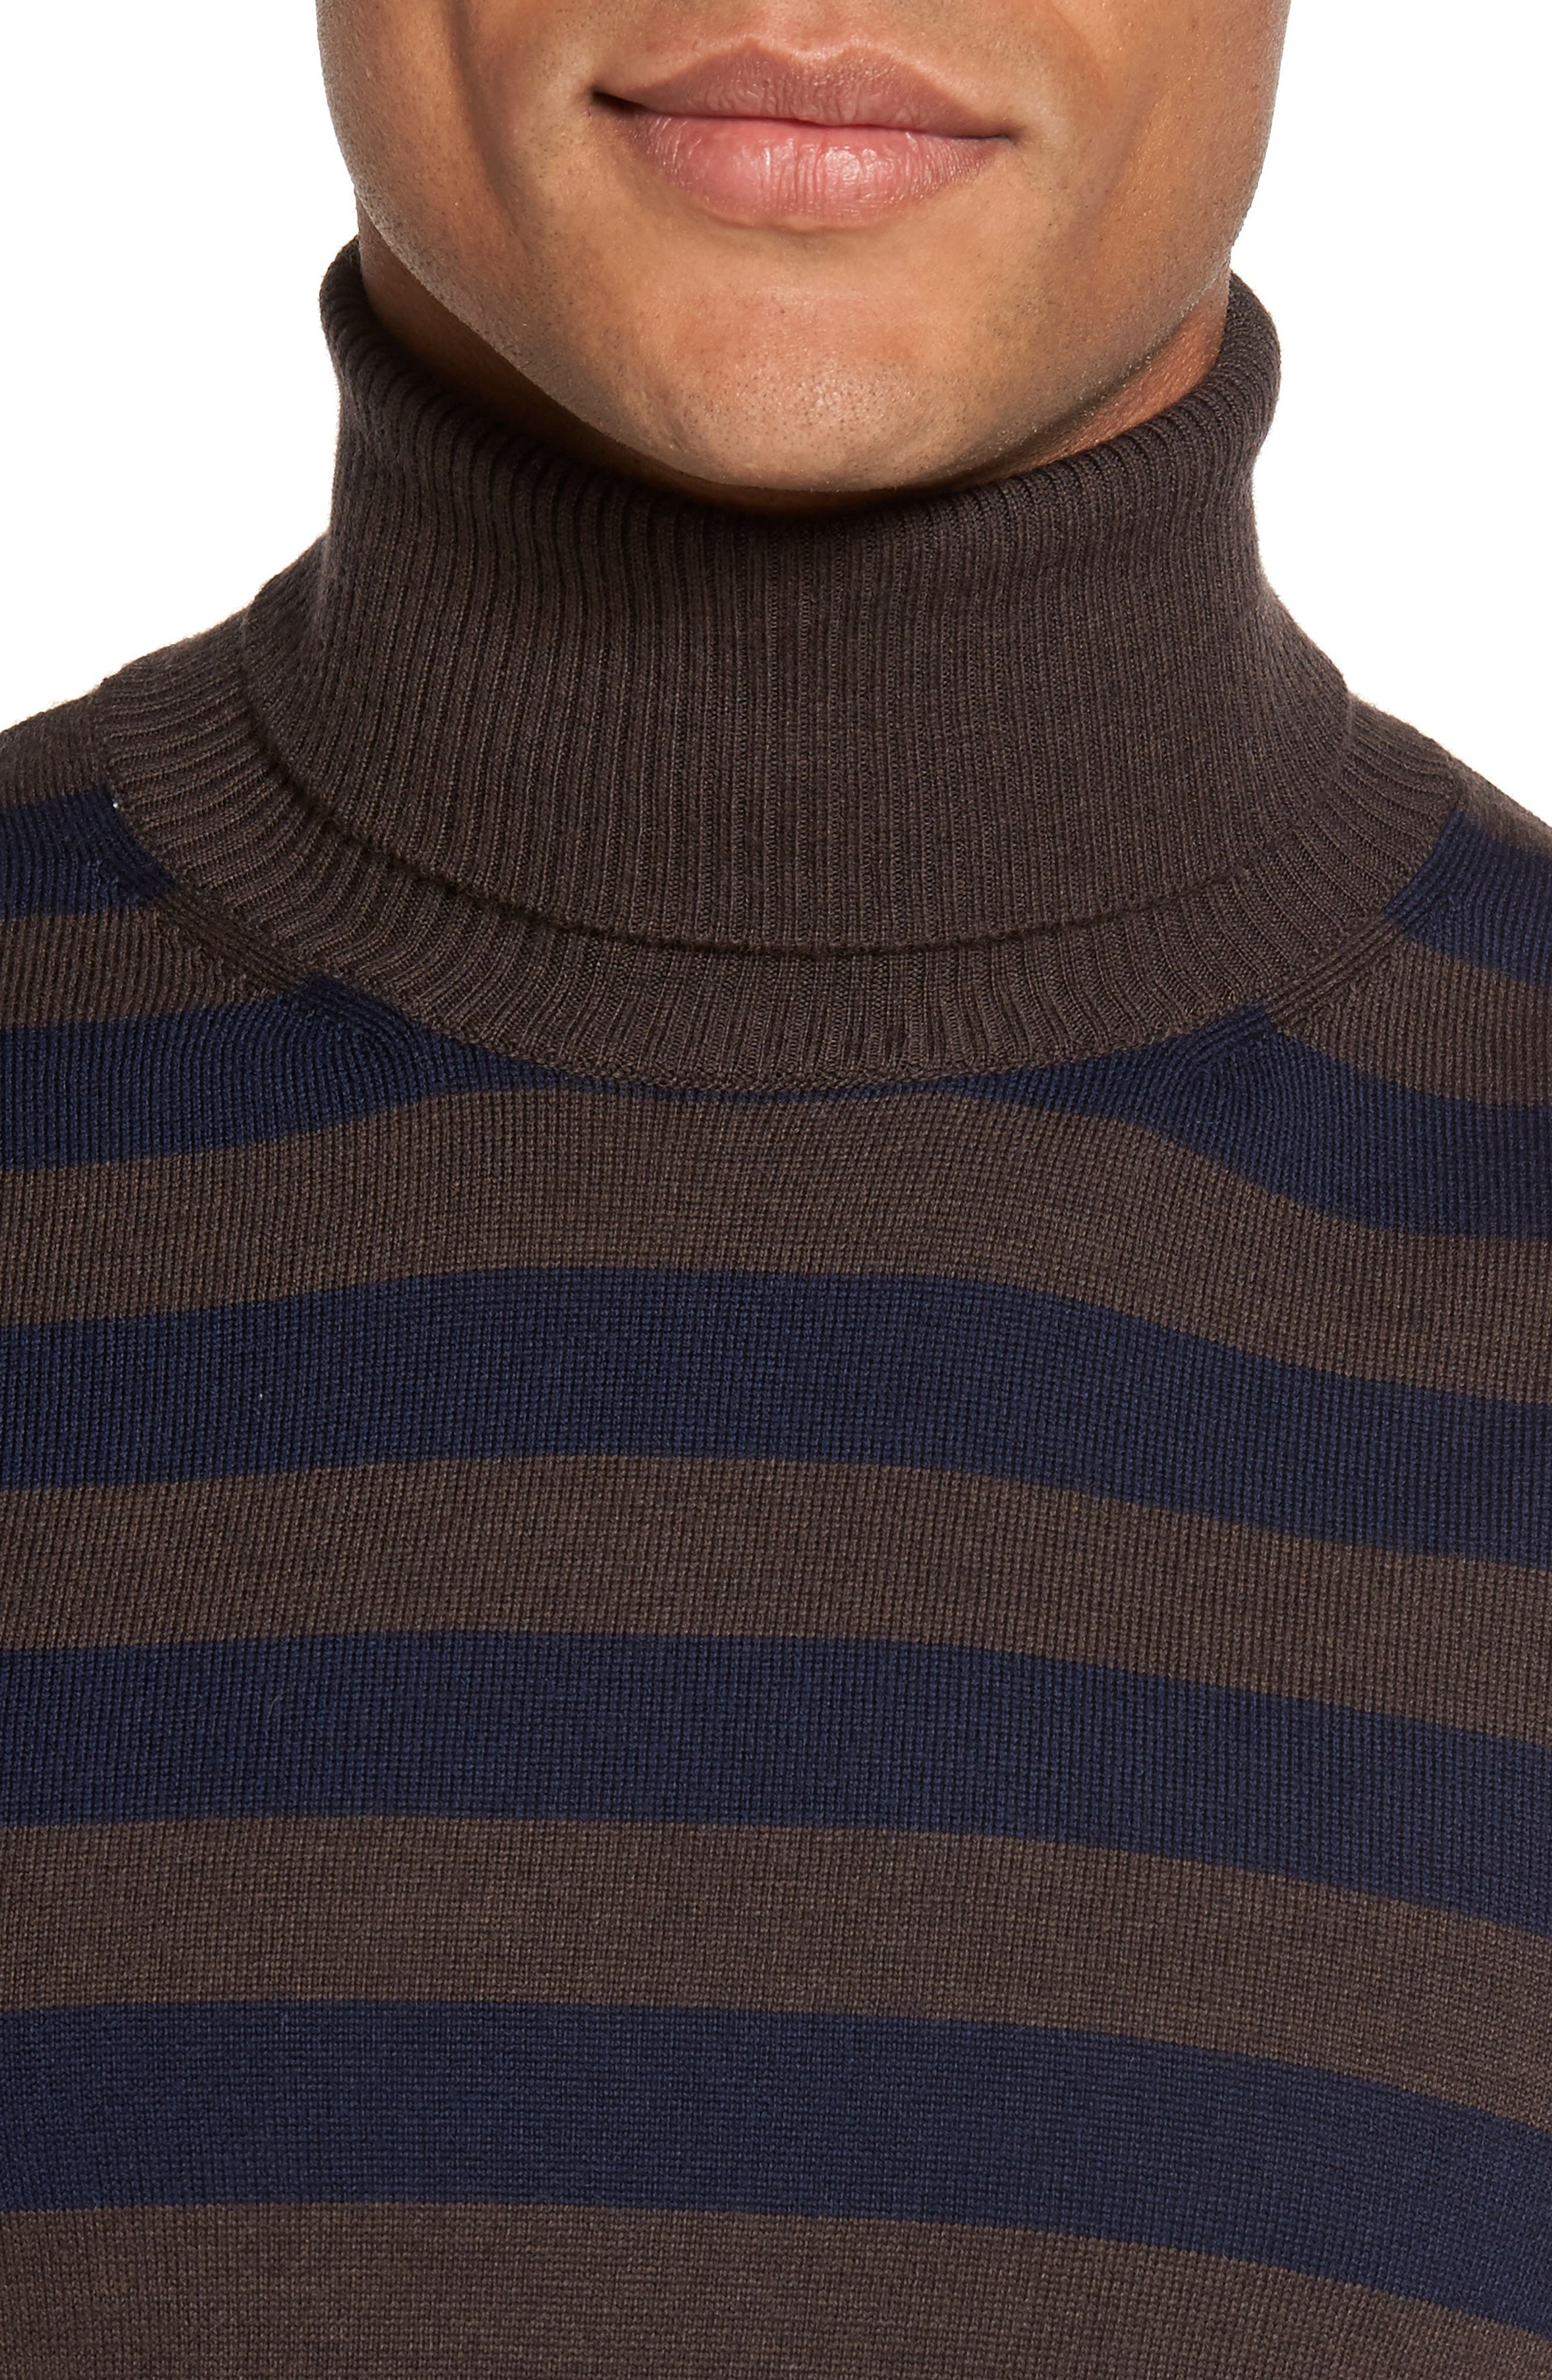 Alternate Image 4  - Eleventy Striped Turtleneck Sweater